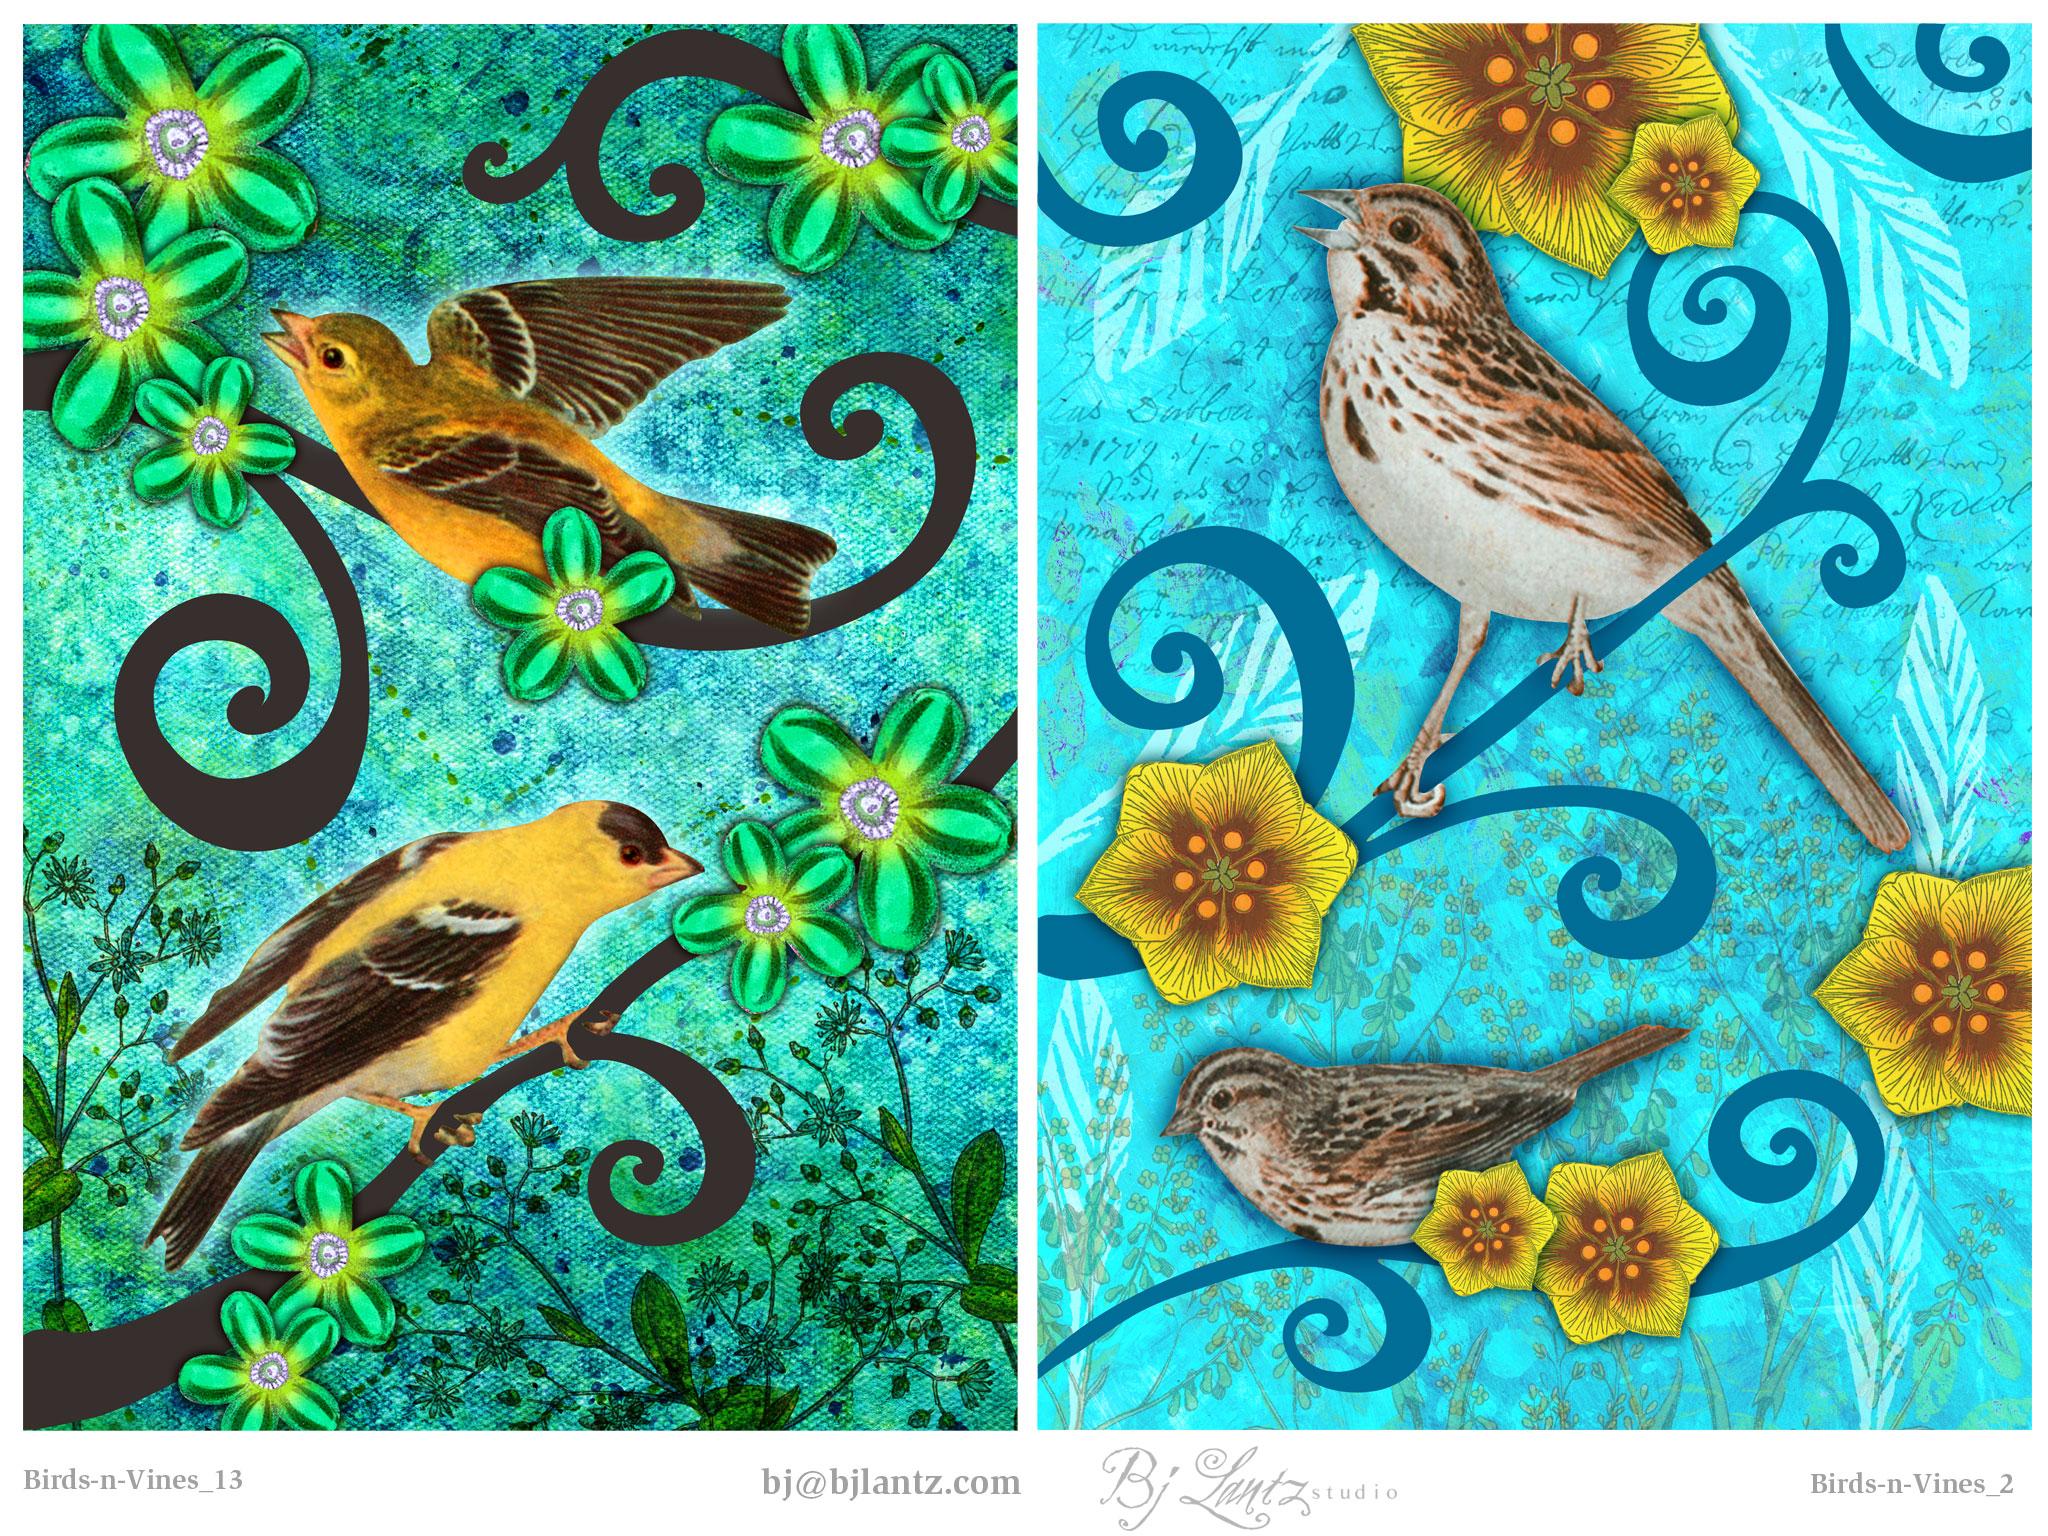 Birds-n-Vines_BJLantz_8.jpg